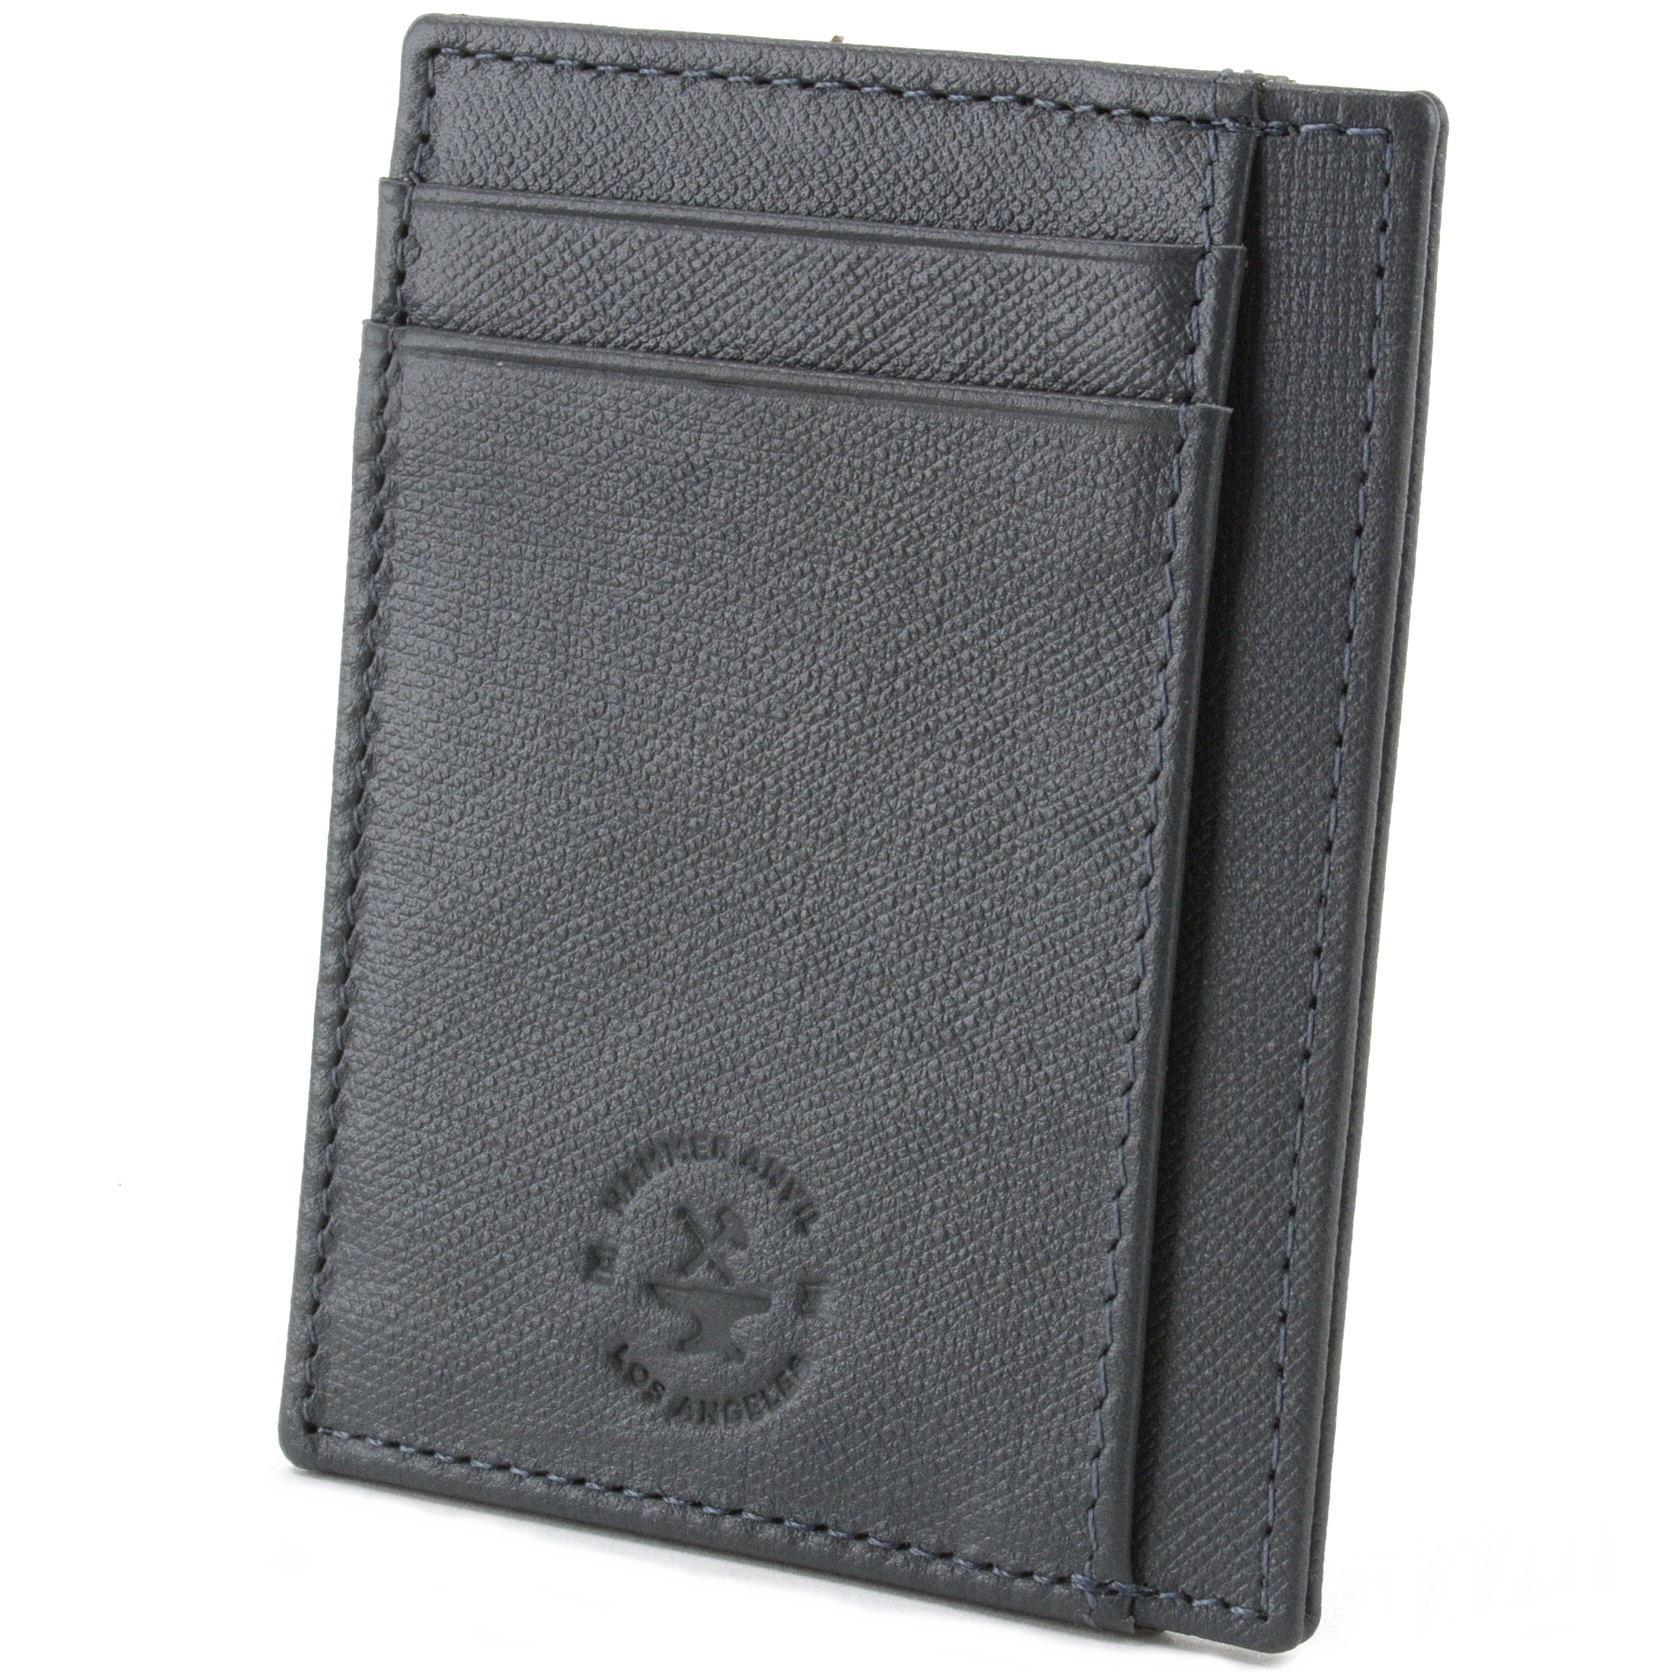 miniature 53 - Hammer-Anvil-Minimalist-Front-Pocket-Wallet-RFID-Blocking-Thin-Leather-Card-Case